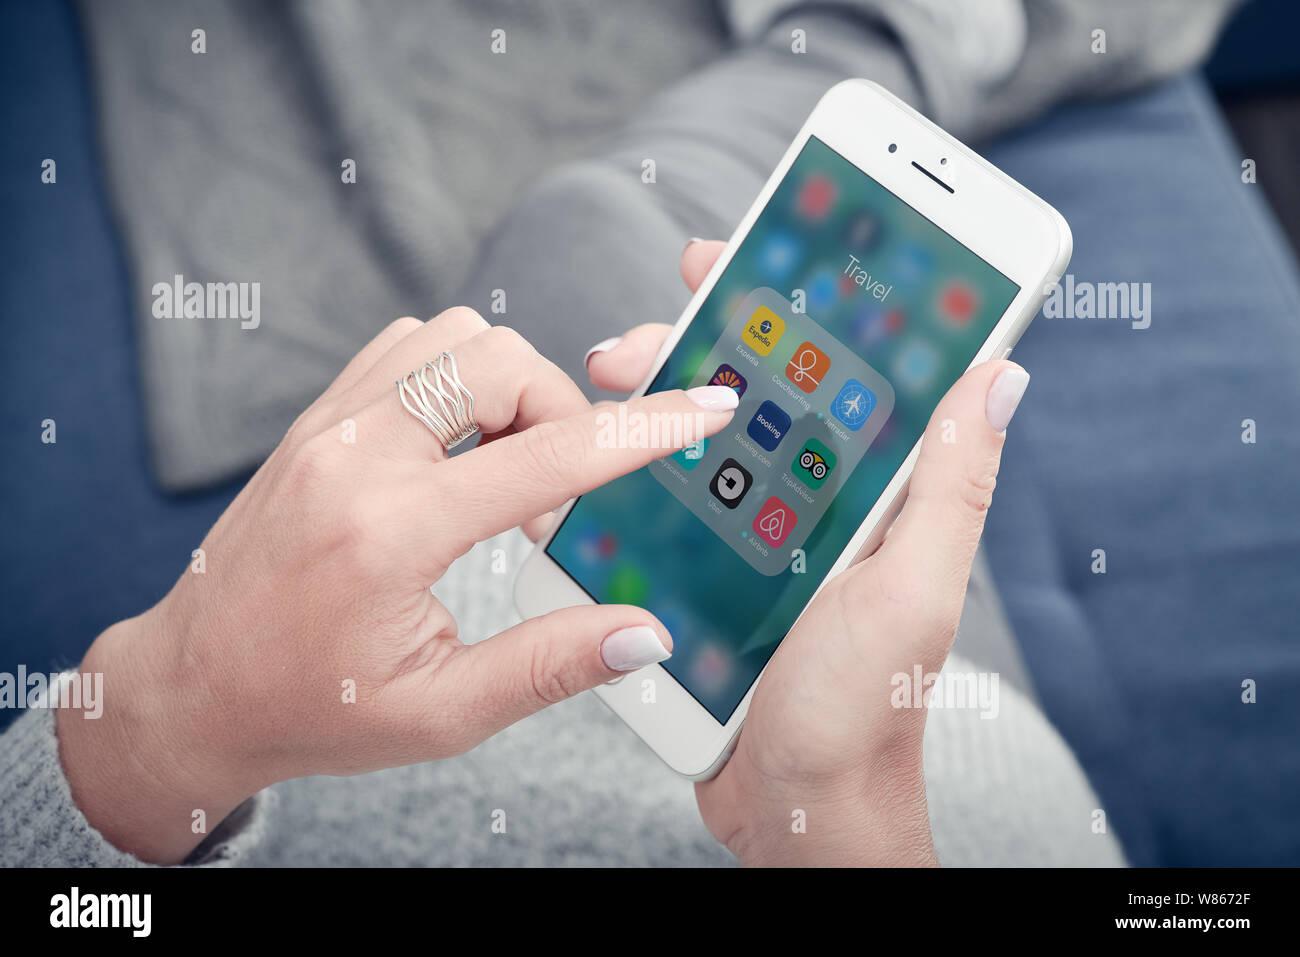 Kyiv, Ukraine - January 24, 2018: Woman using travel apps on